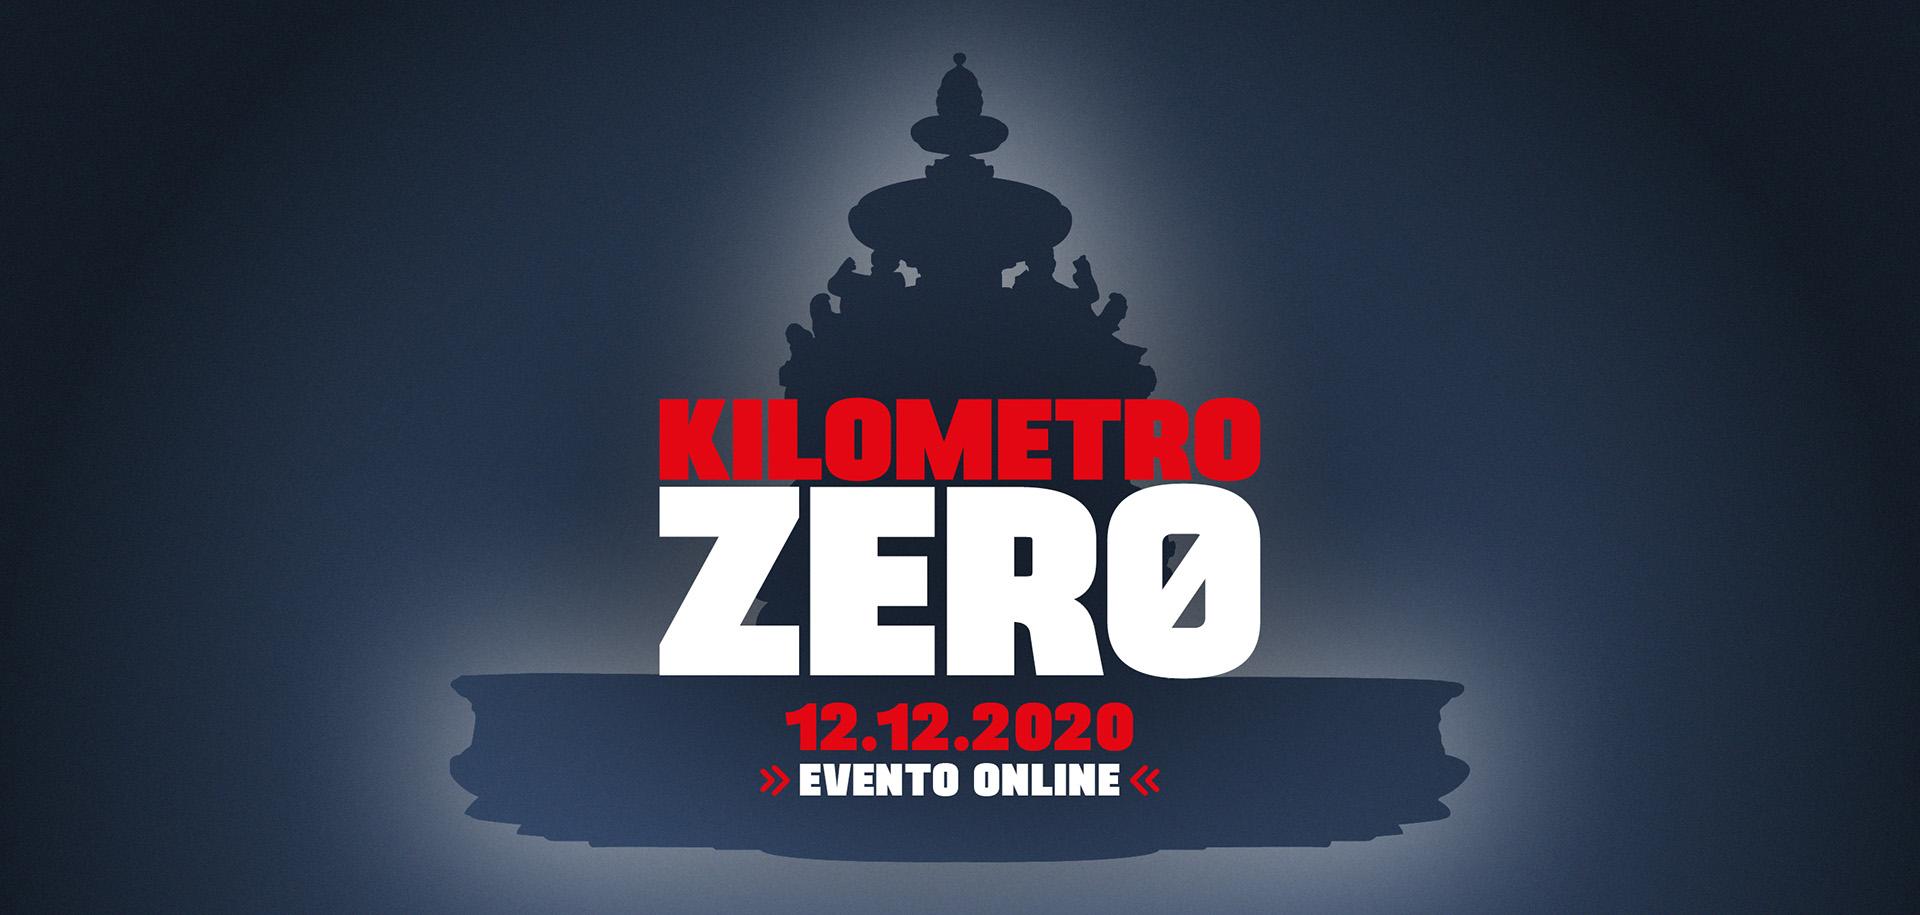 TEDxCesena - kilometro zero copertina